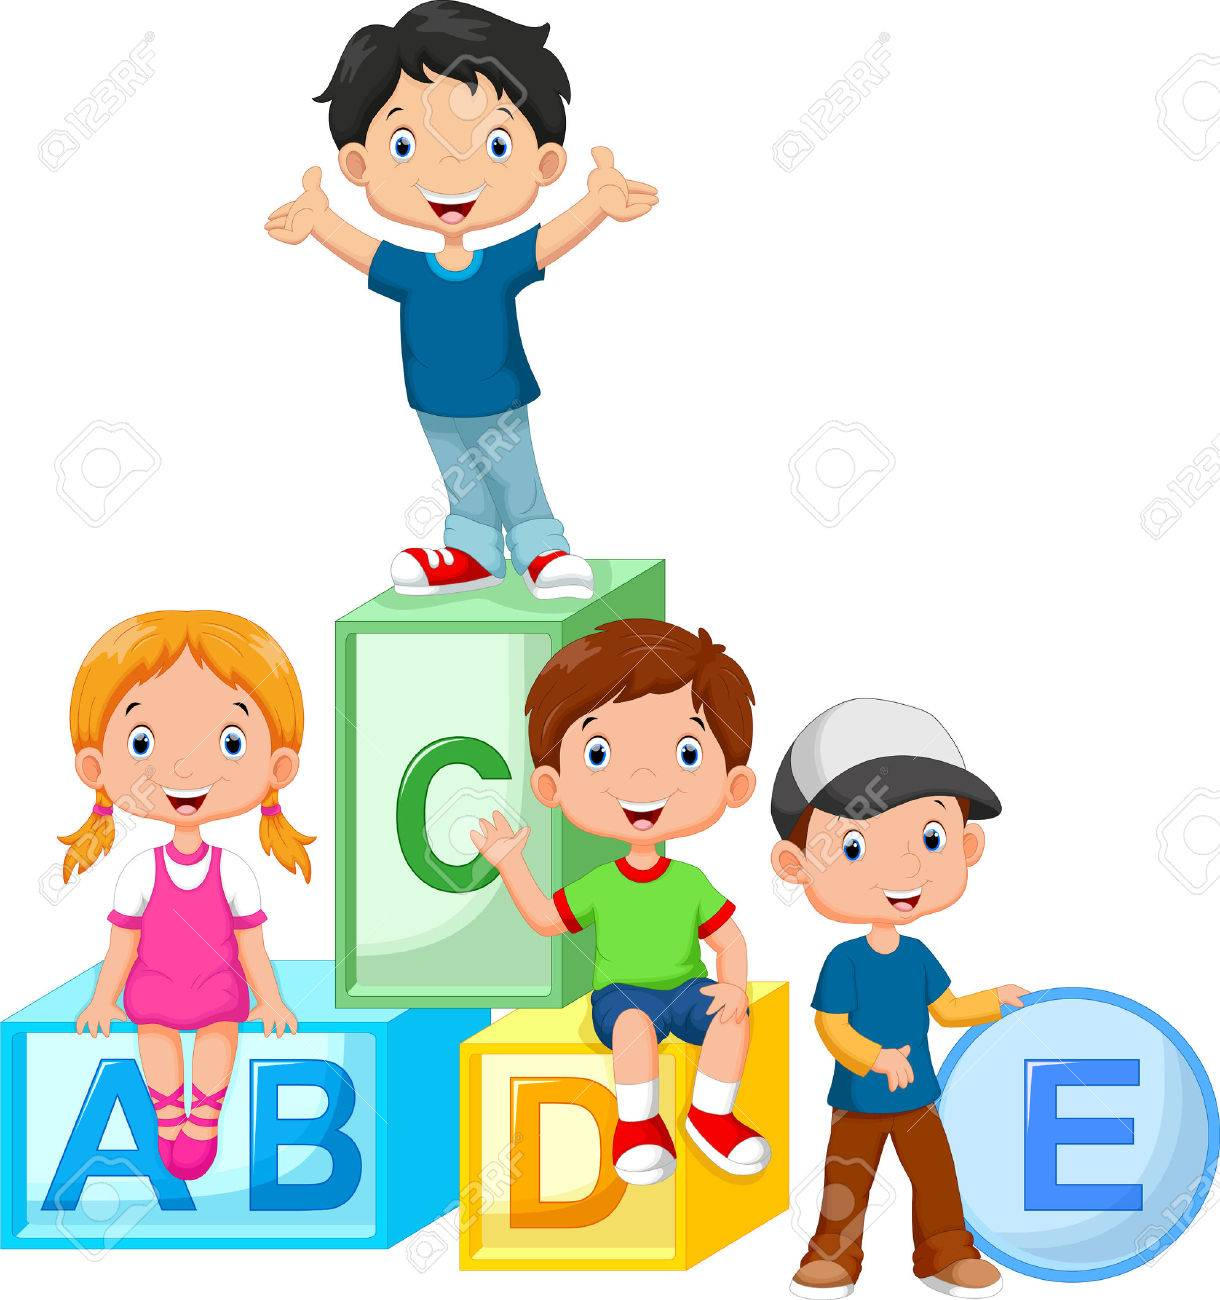 Happy school children playing with alphabet blocks - 47538199